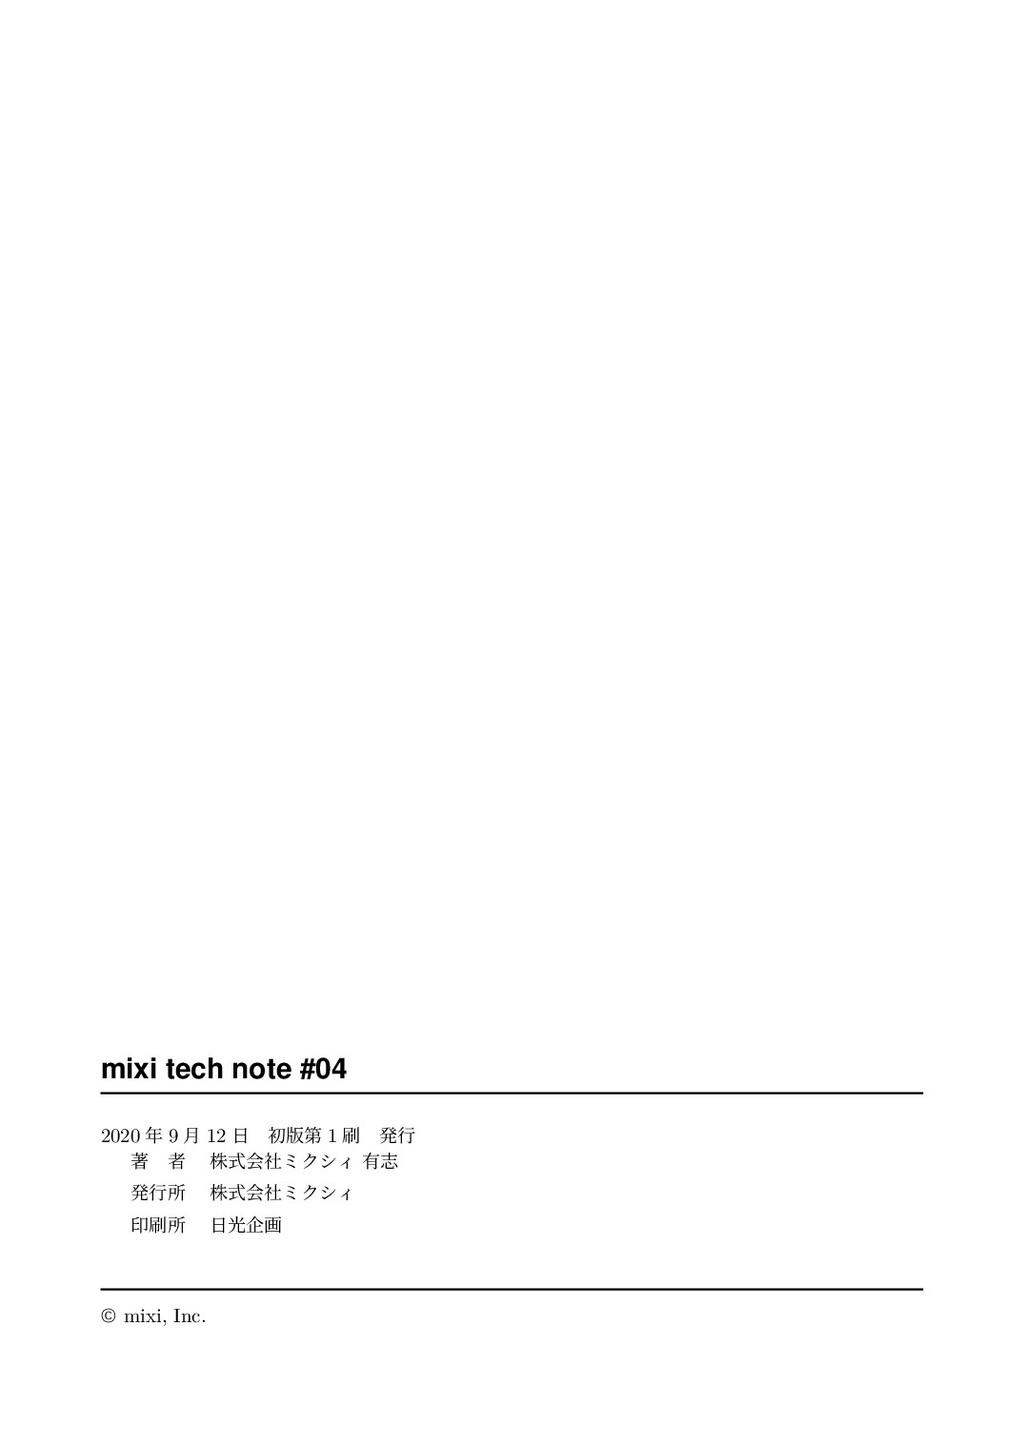 mixi tech note #04 2020  9 ݄ 12 ɹॳ൛ୈ 1 ɹൃߦ ஶ...